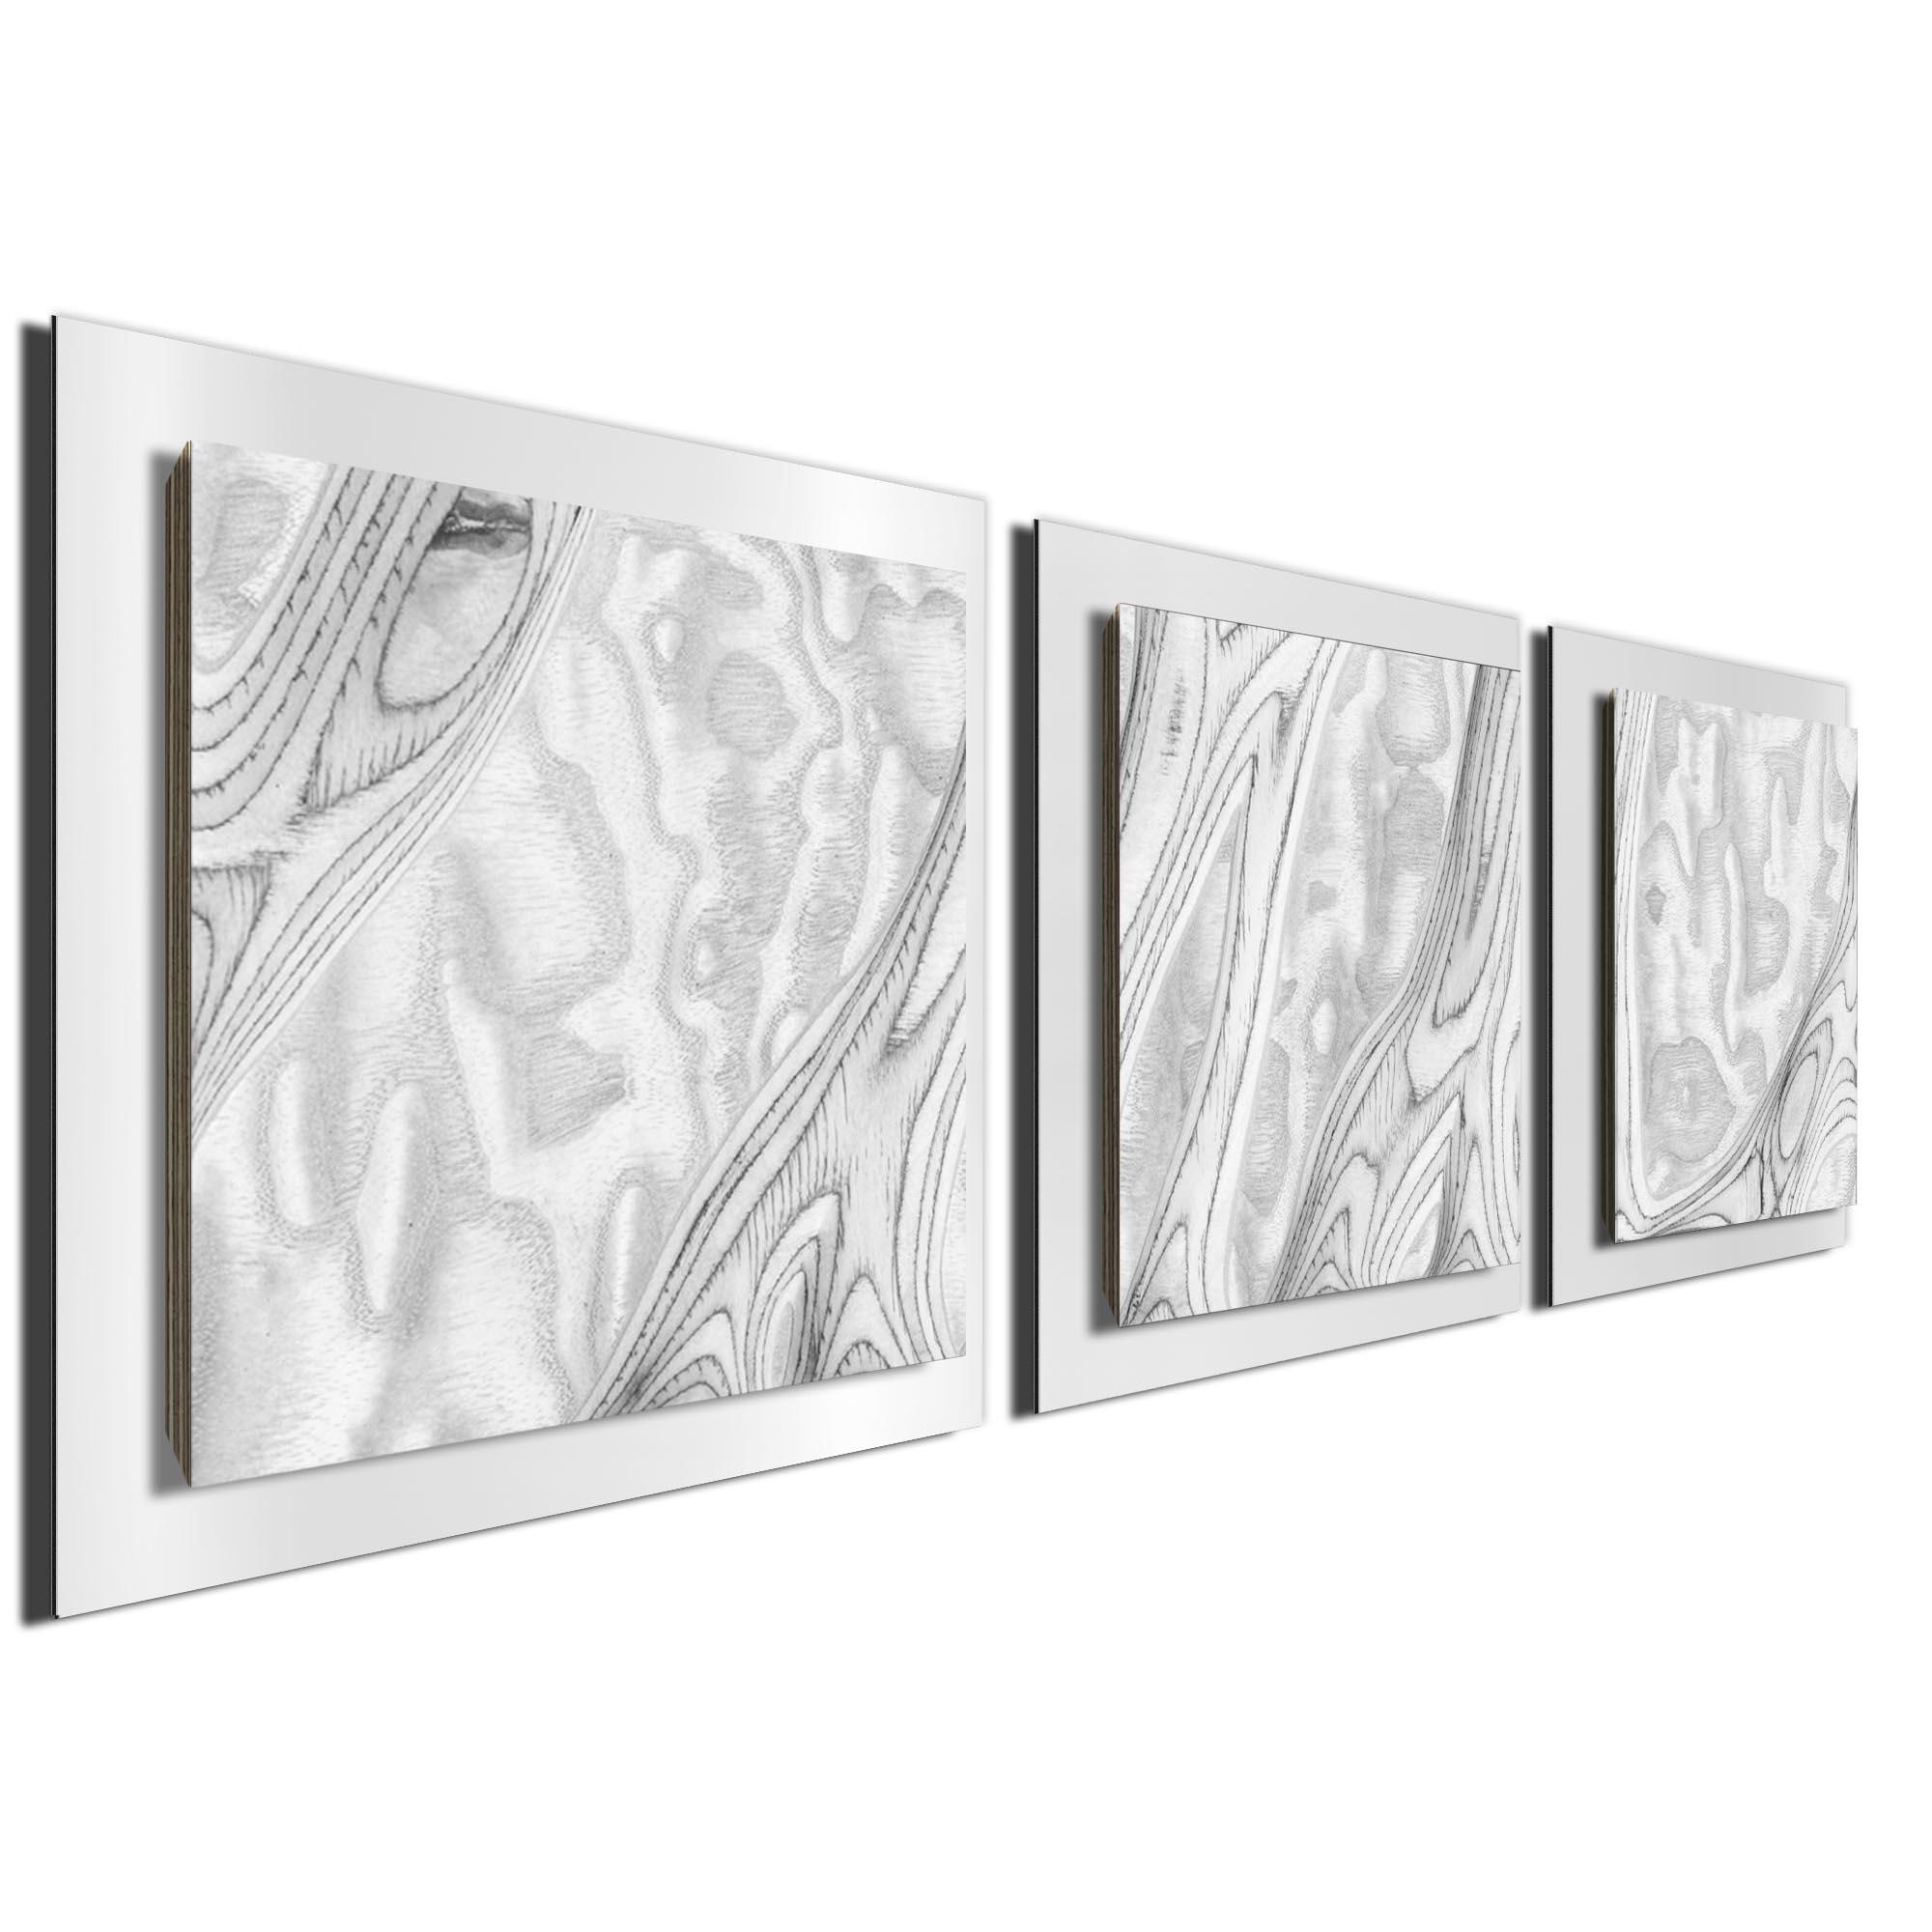 Whitewash Burl Essence White by Jackson Wright Rustic Modern Style Wood Wall Art - Image 2